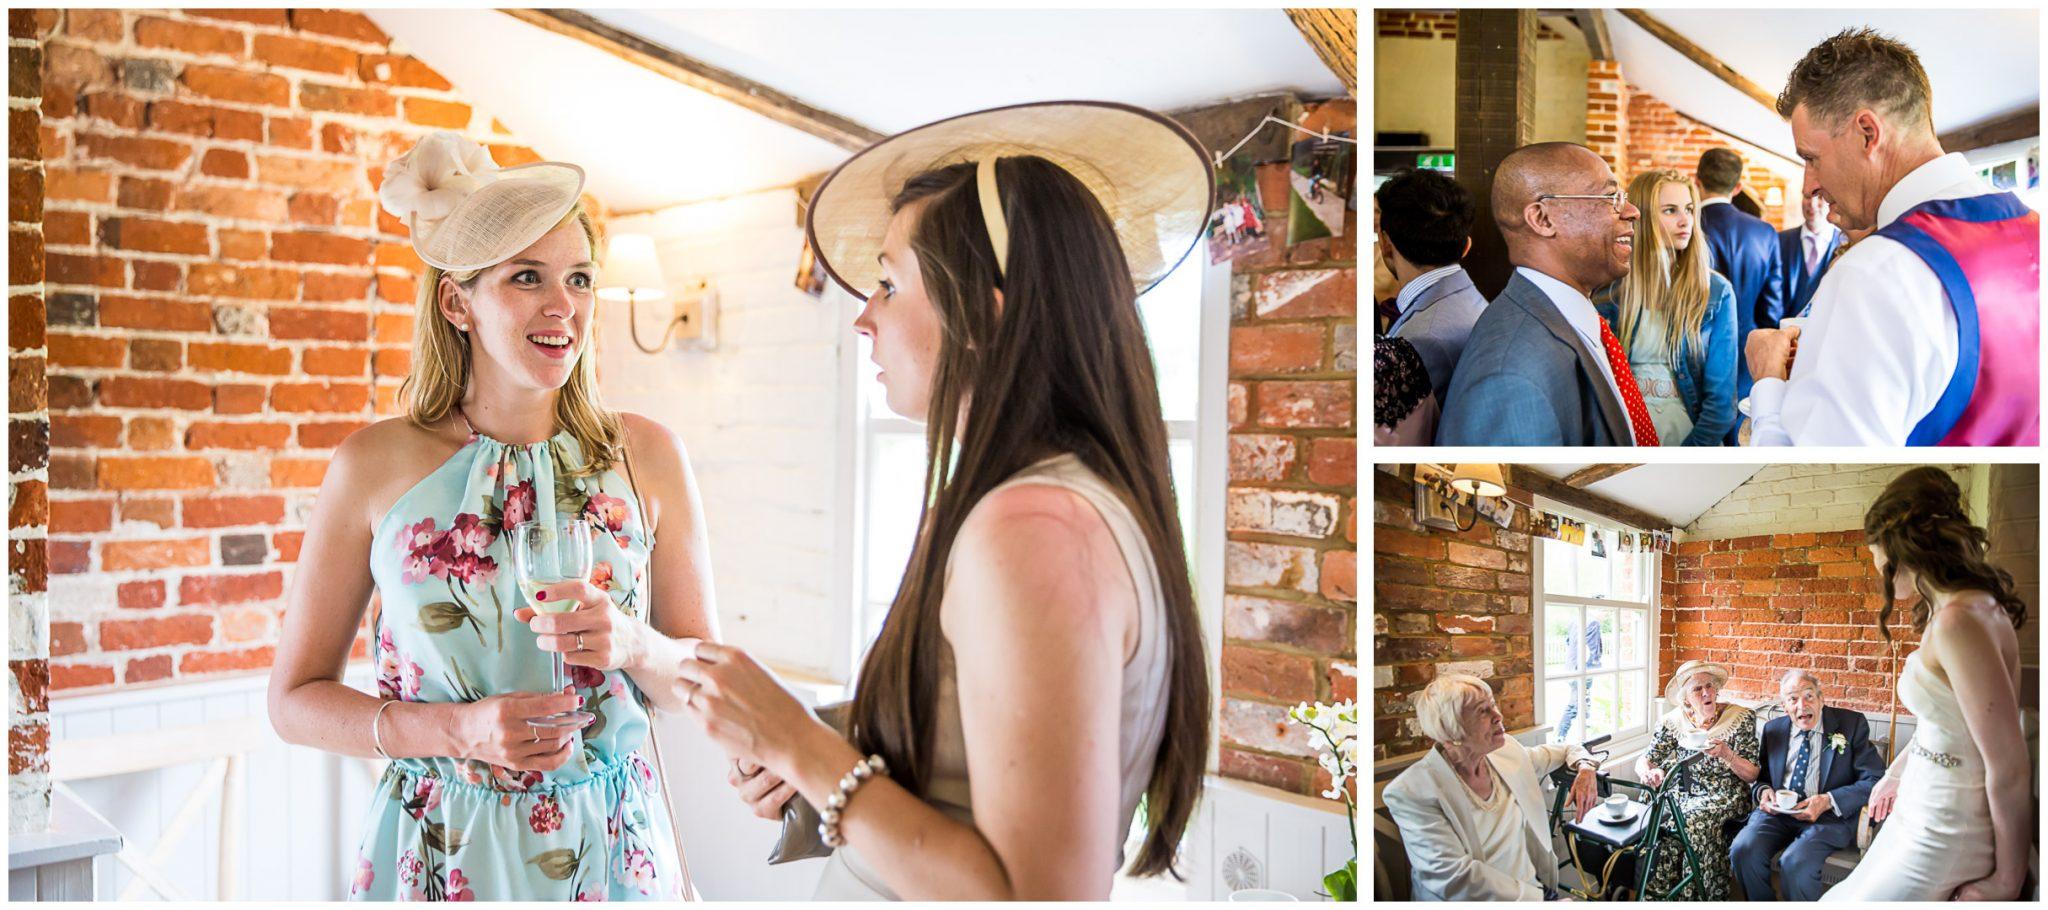 Sopley Mill Summer wedding inside the mill, in the boat room